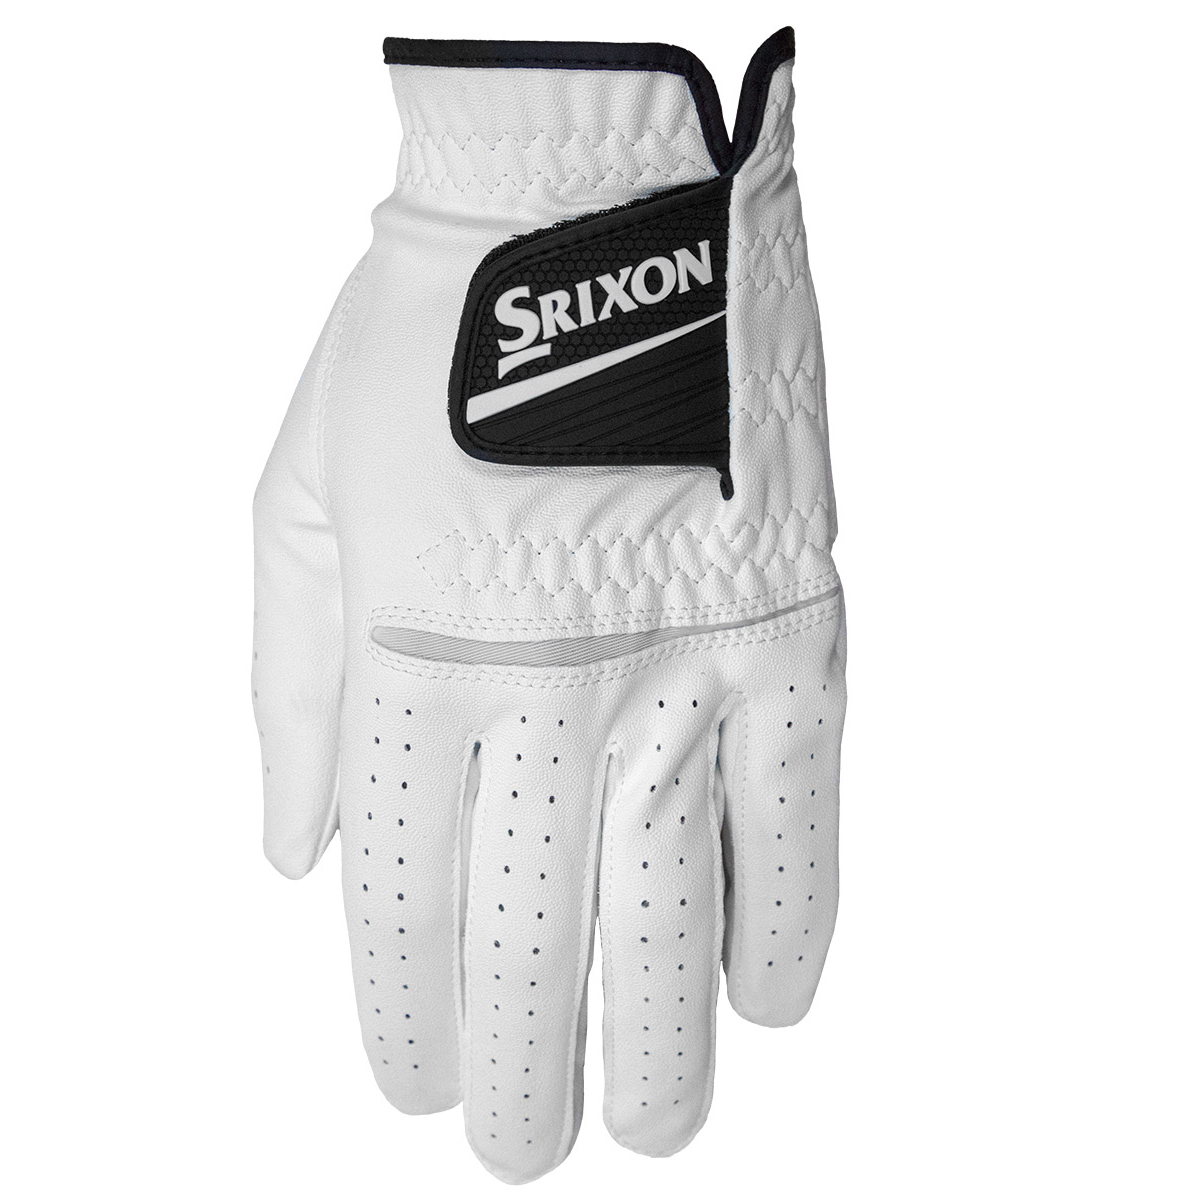 087b5af08e28d Srixon All Weather Glove 2018